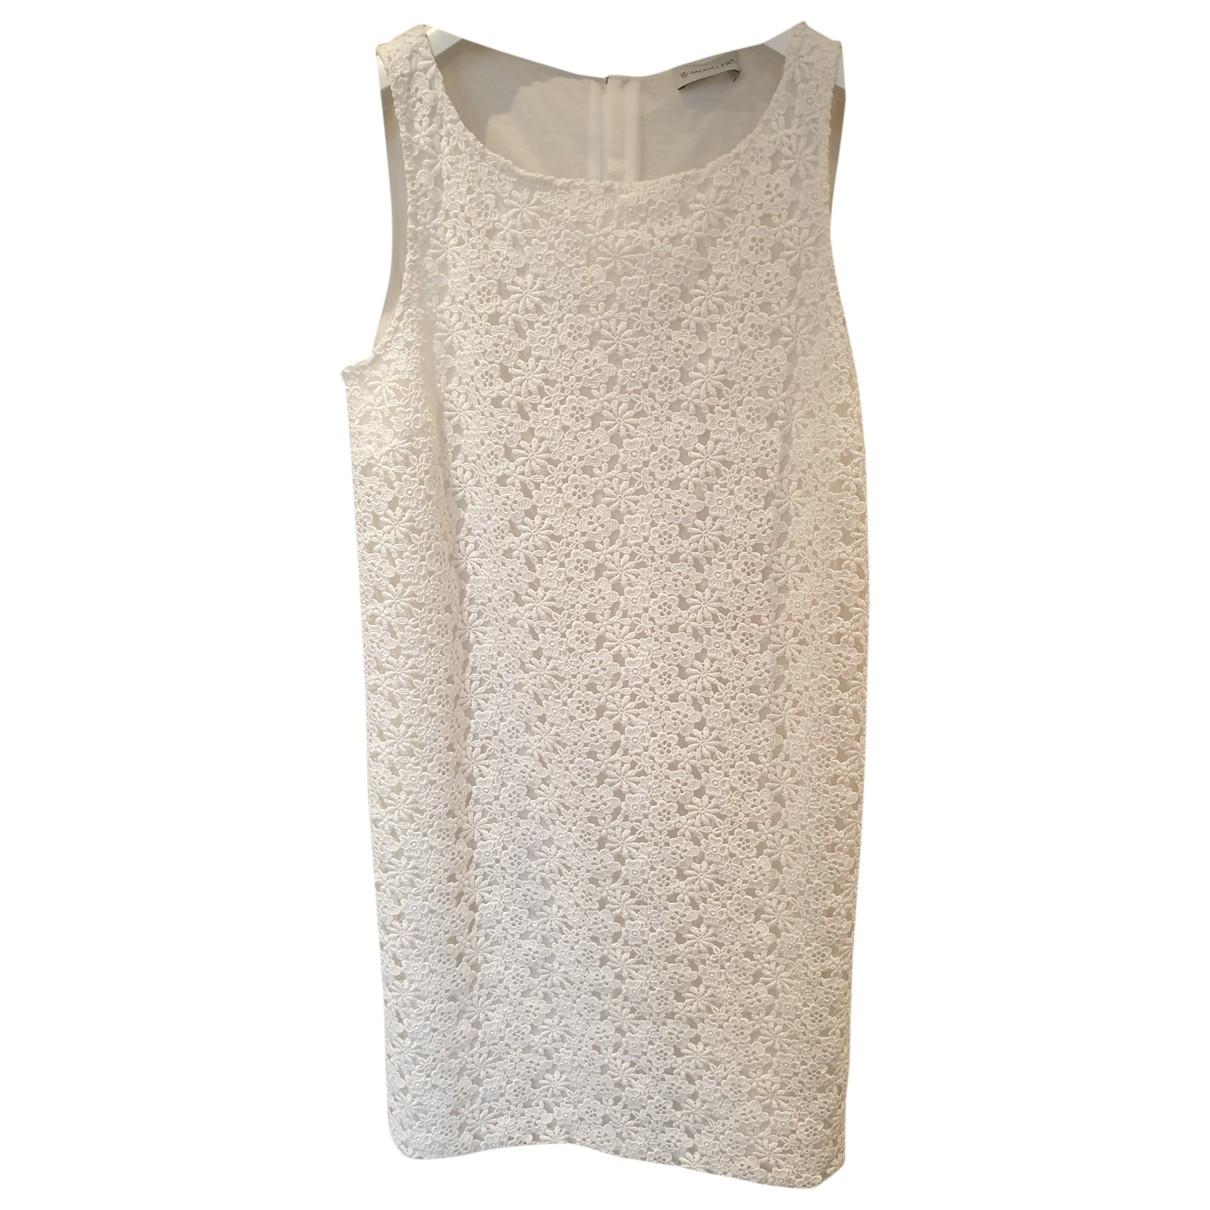 Moncler \N White dress for Women 44 IT